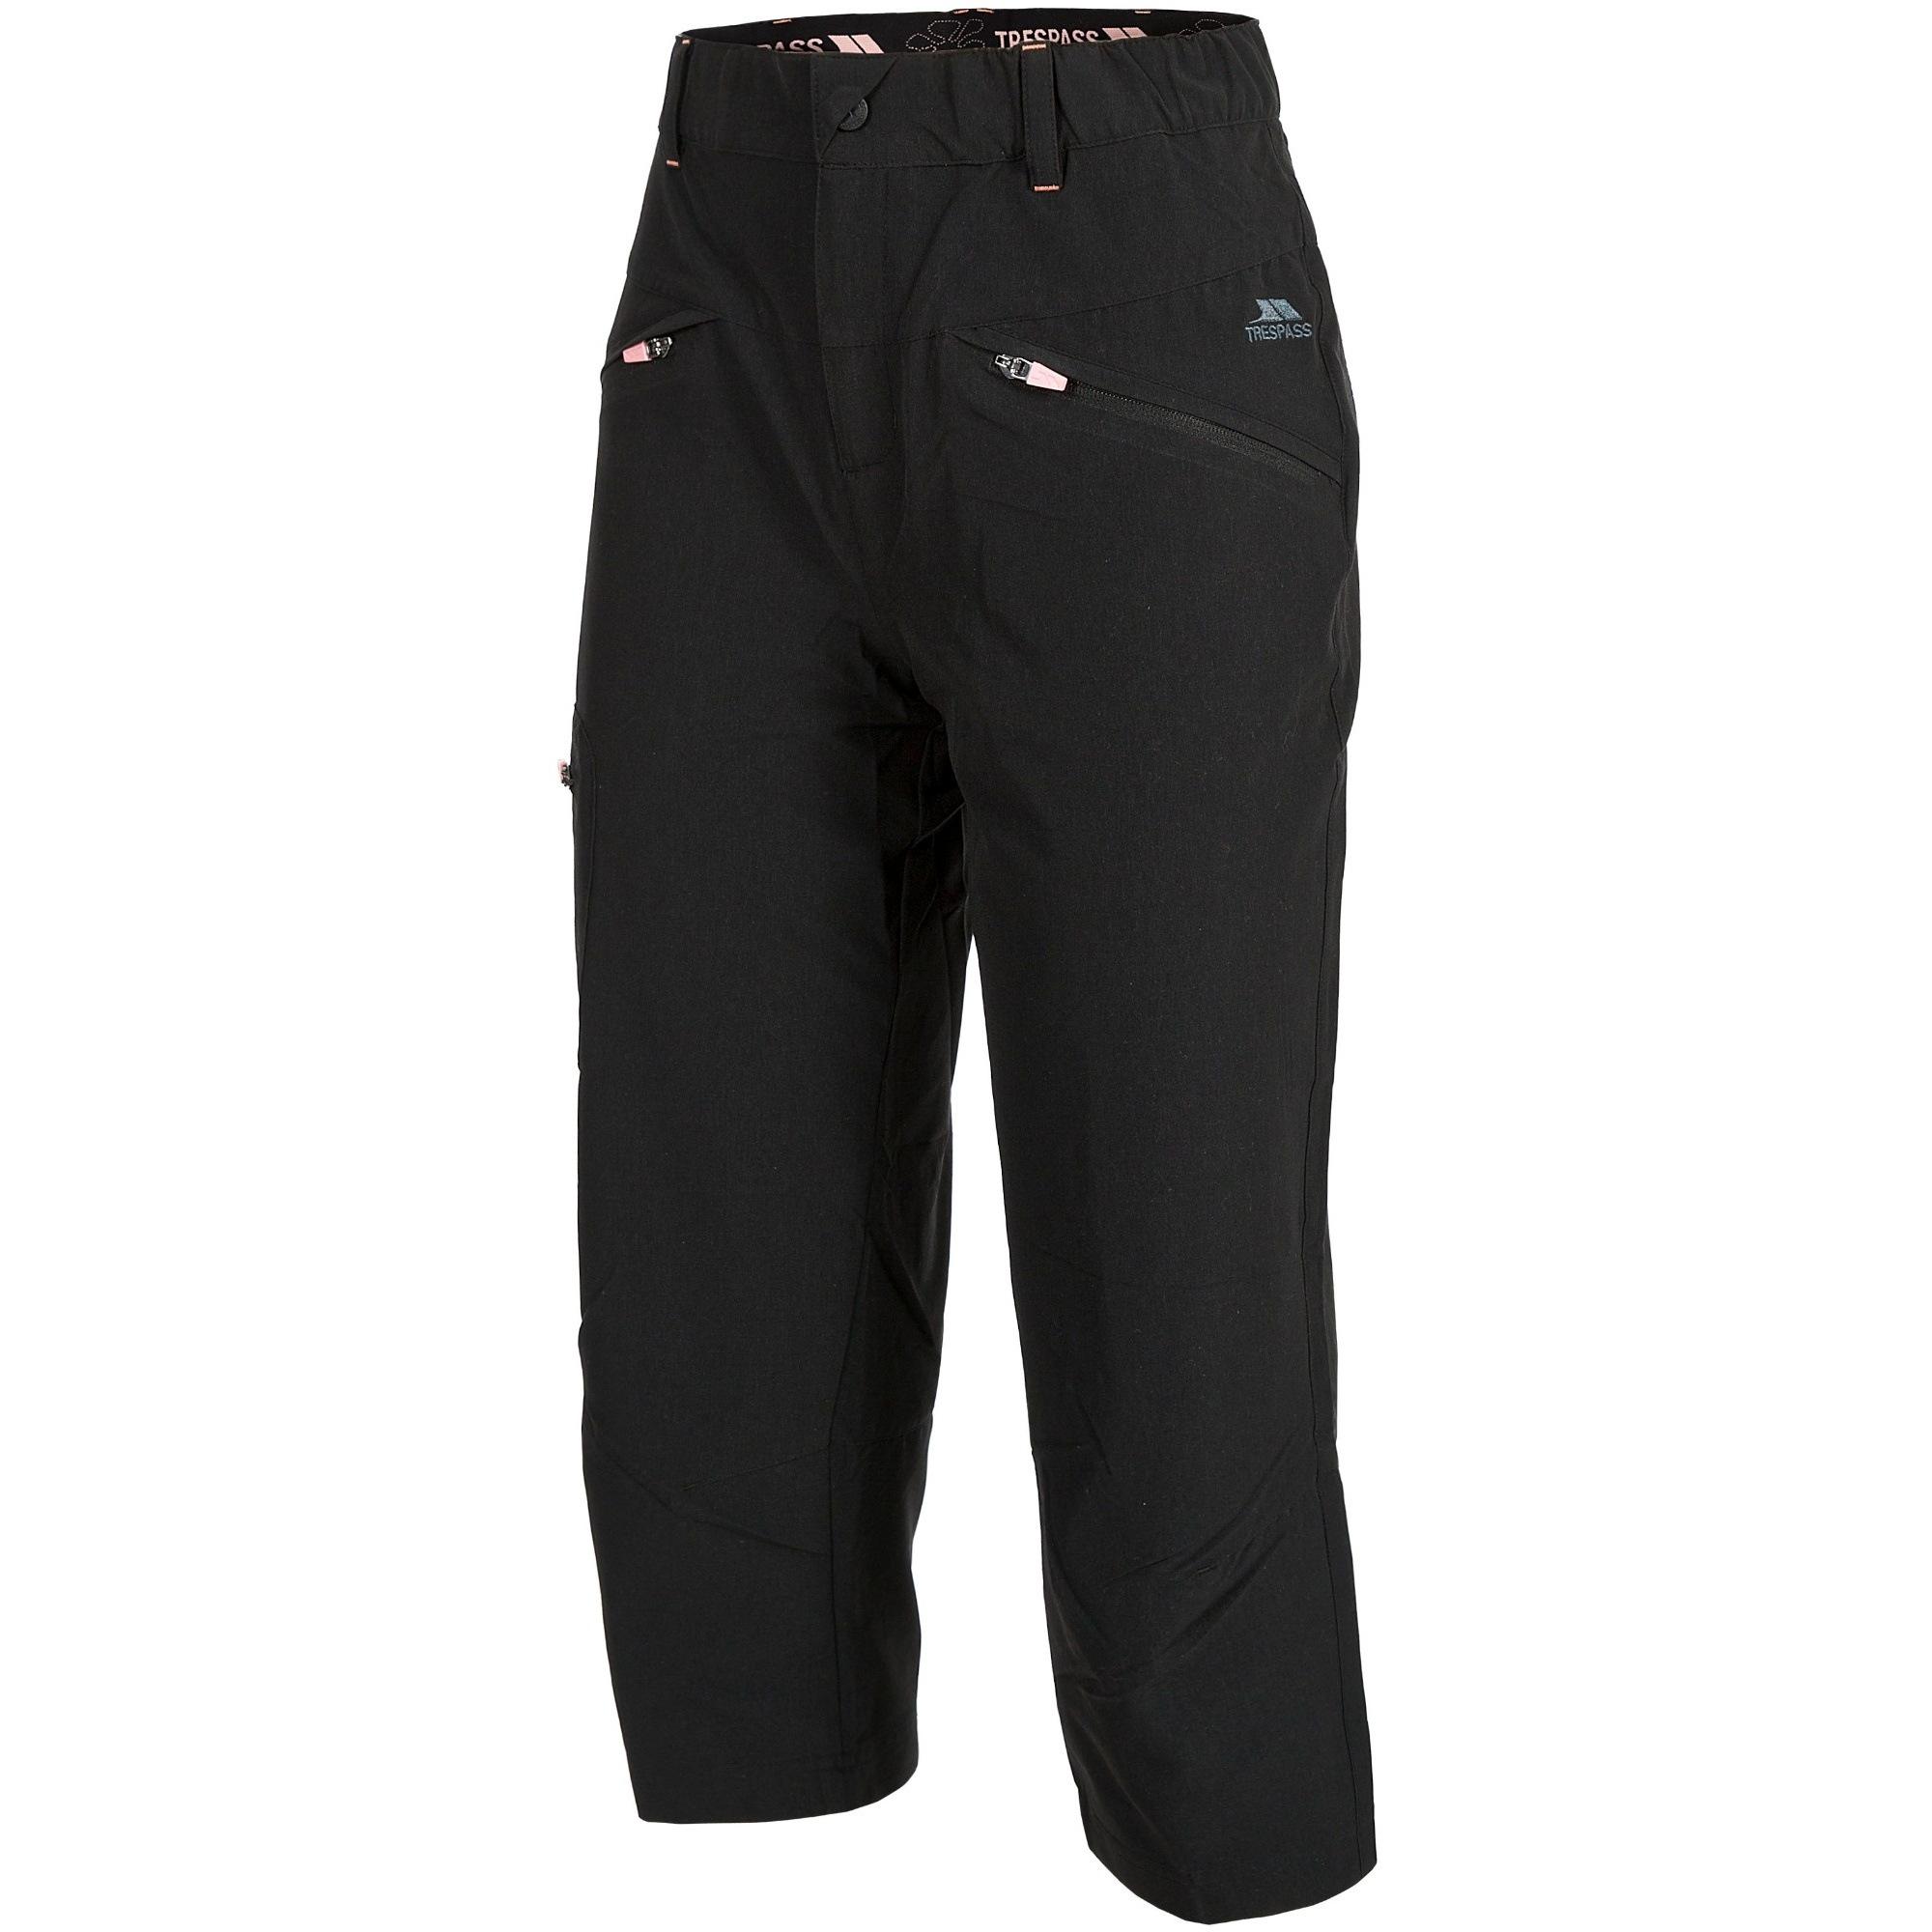 Trespass Shorts Damen Easher 3/4